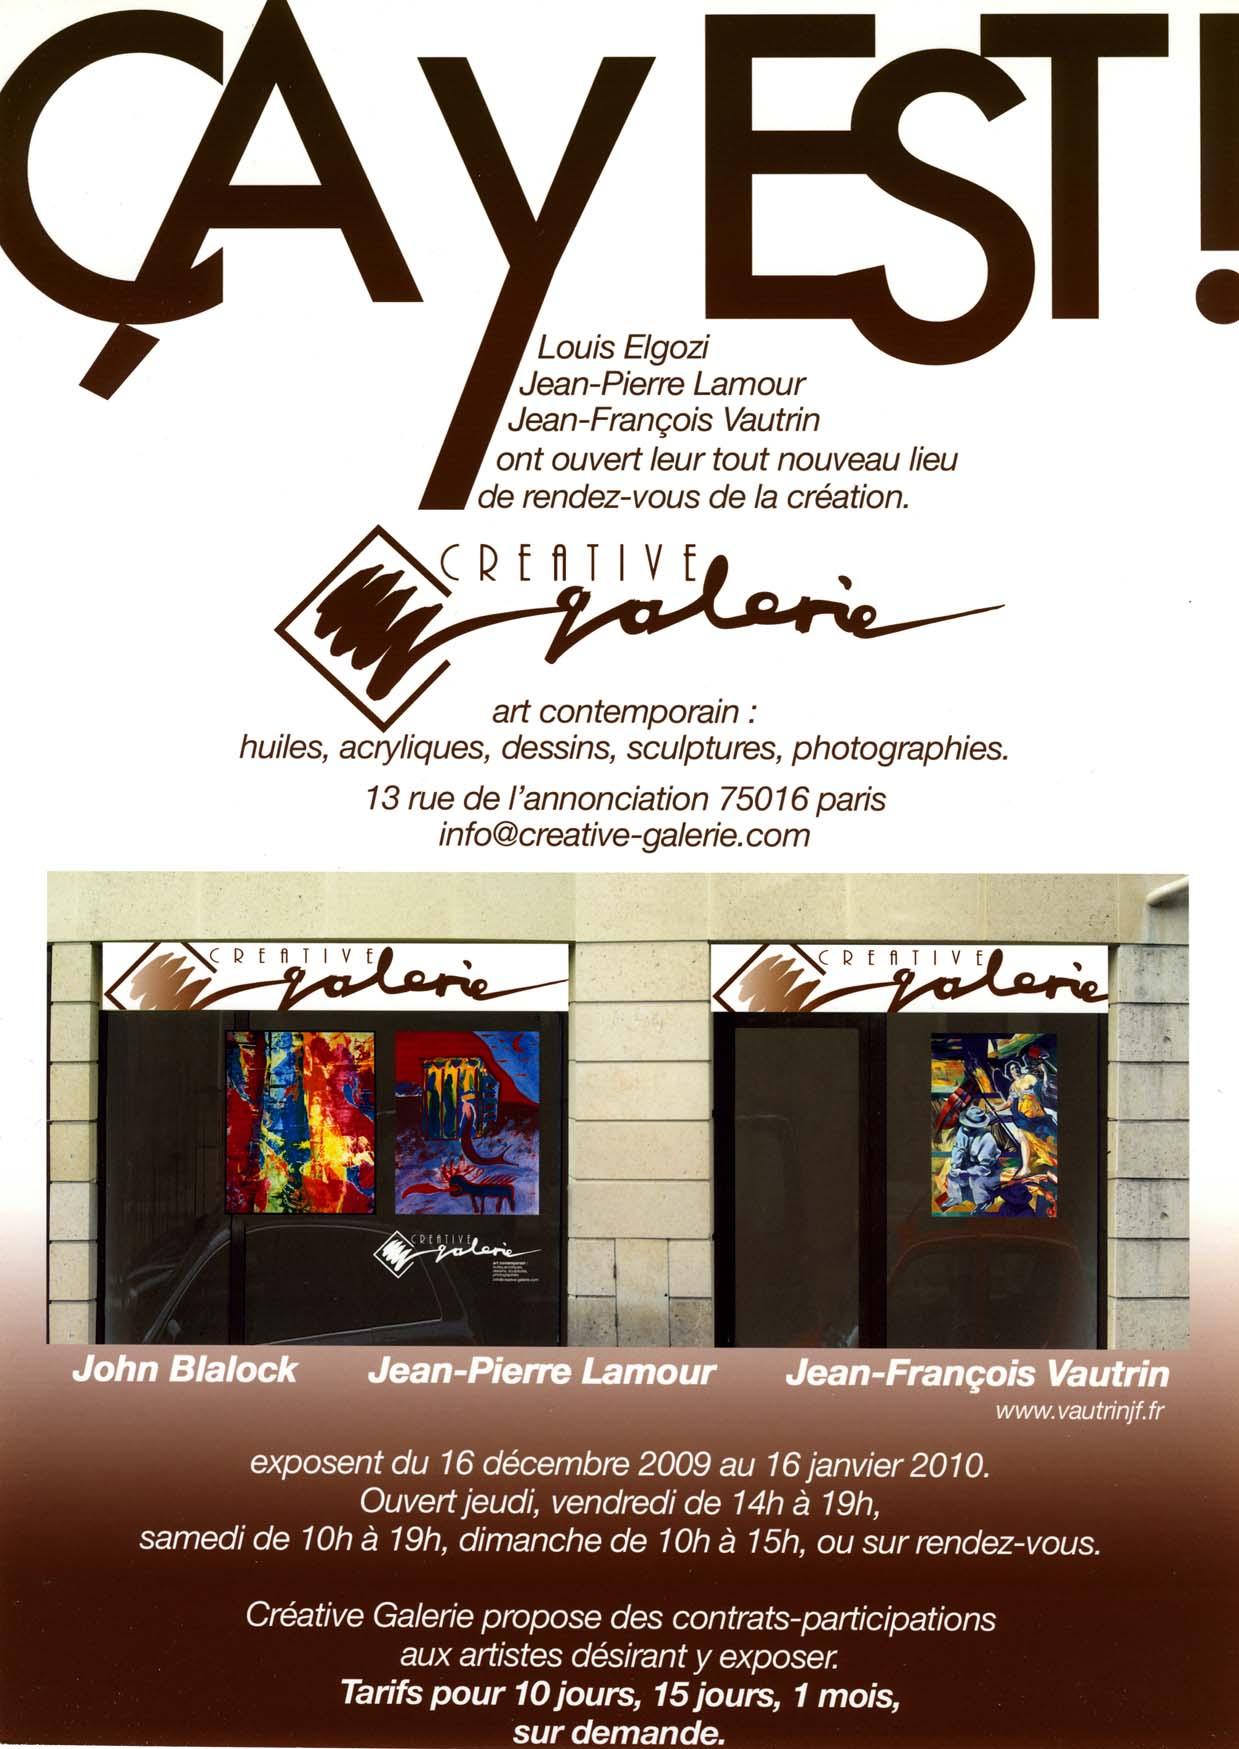 2009 Créative Galerie